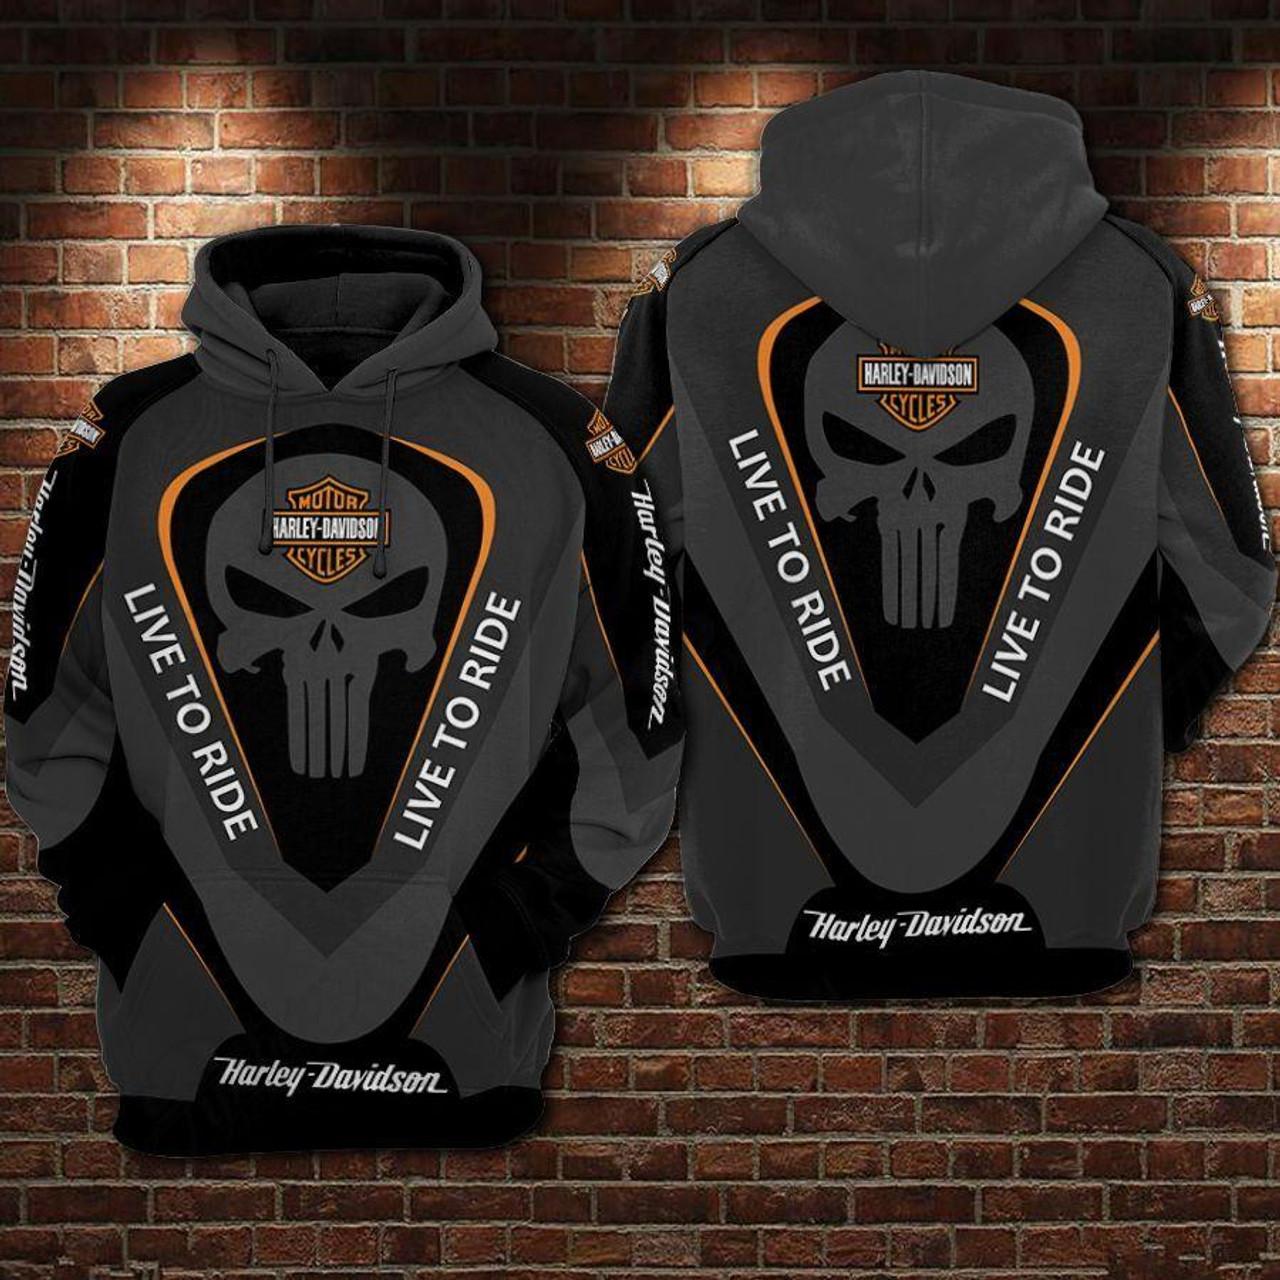 **(OFFICIAL-HARLEY-DAVIDSON-MOTORCYCLE-BIKER-PULLOVER-HOODIES/BIG-CLASSIC-HARLEY-PUNISHER-SKULL & LIVE-TO-RIDE/OFFICIAL-CUSTOM-HARLEY-DAVIDSON-LOGOS & OFFICIAL-CLASSIC-HARLEY-BLACK & ORANGE-COLORS/WARM-PREMIUM-RIDING-HARLEY-BIKERS-PULLOVER-HOODIES)**